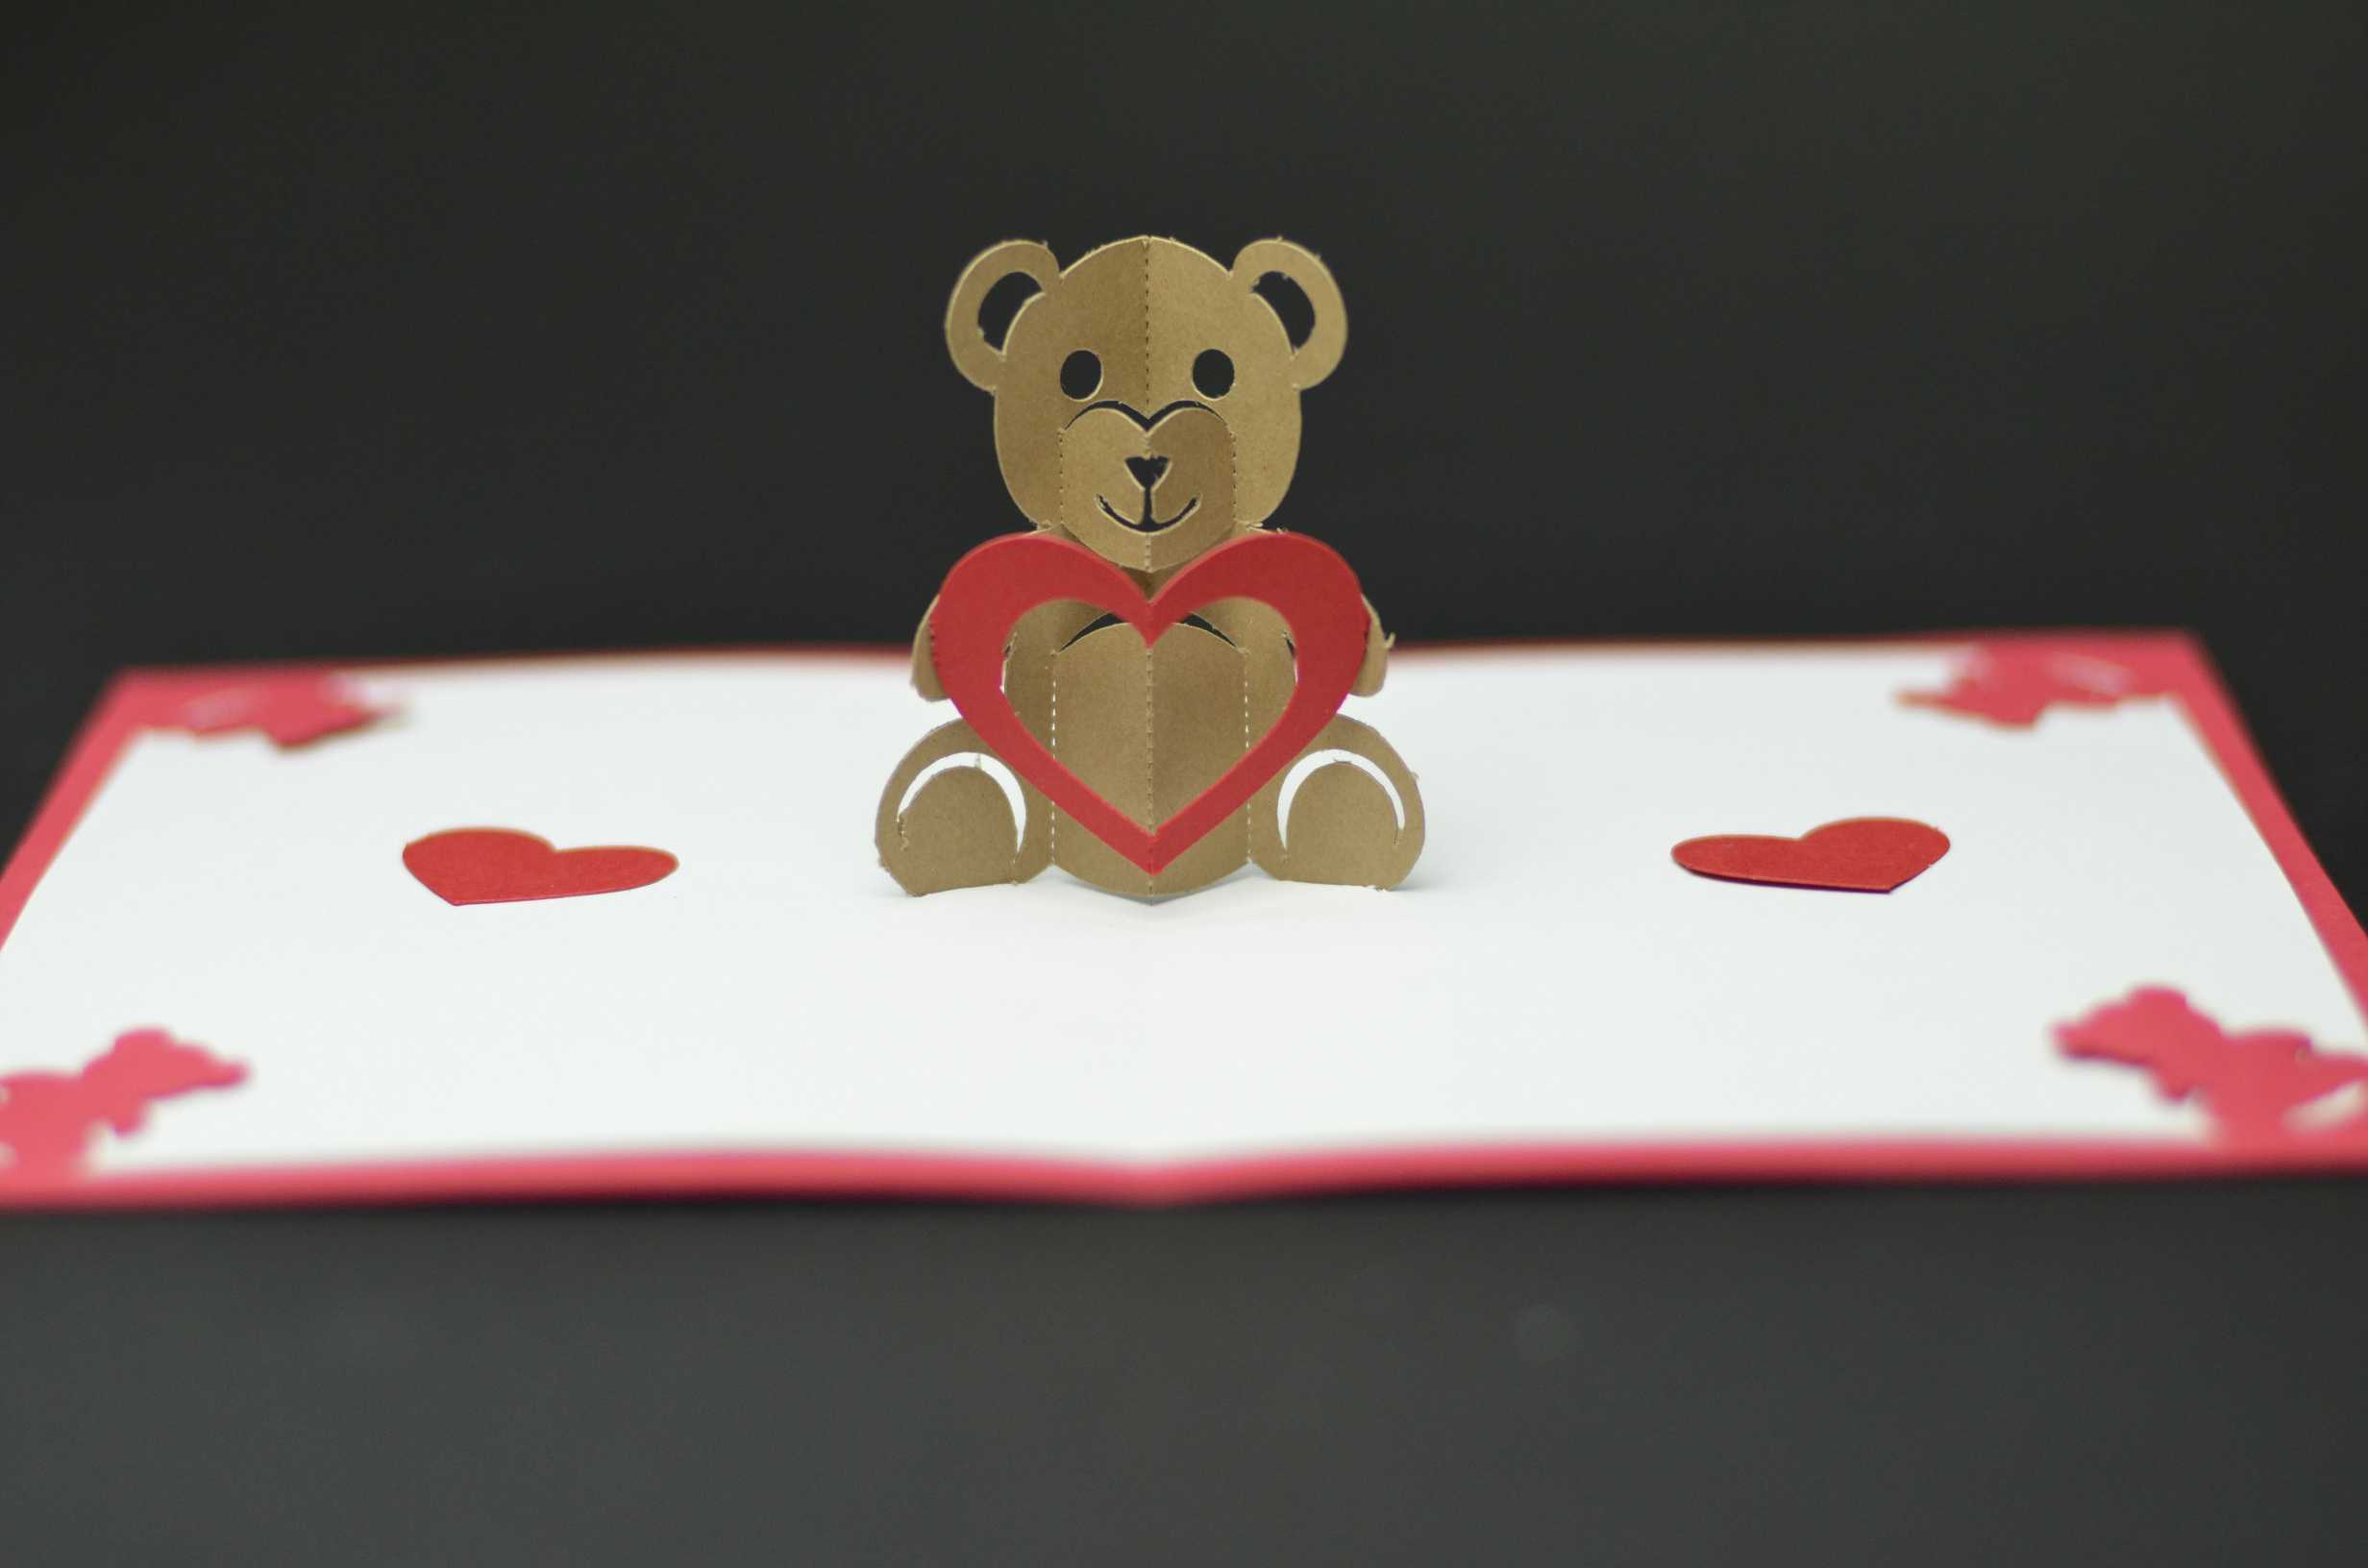 Pop Up Card Tutorials And Templates - Creative Pop Up Cards within Pop Up Card Templates Free Printable